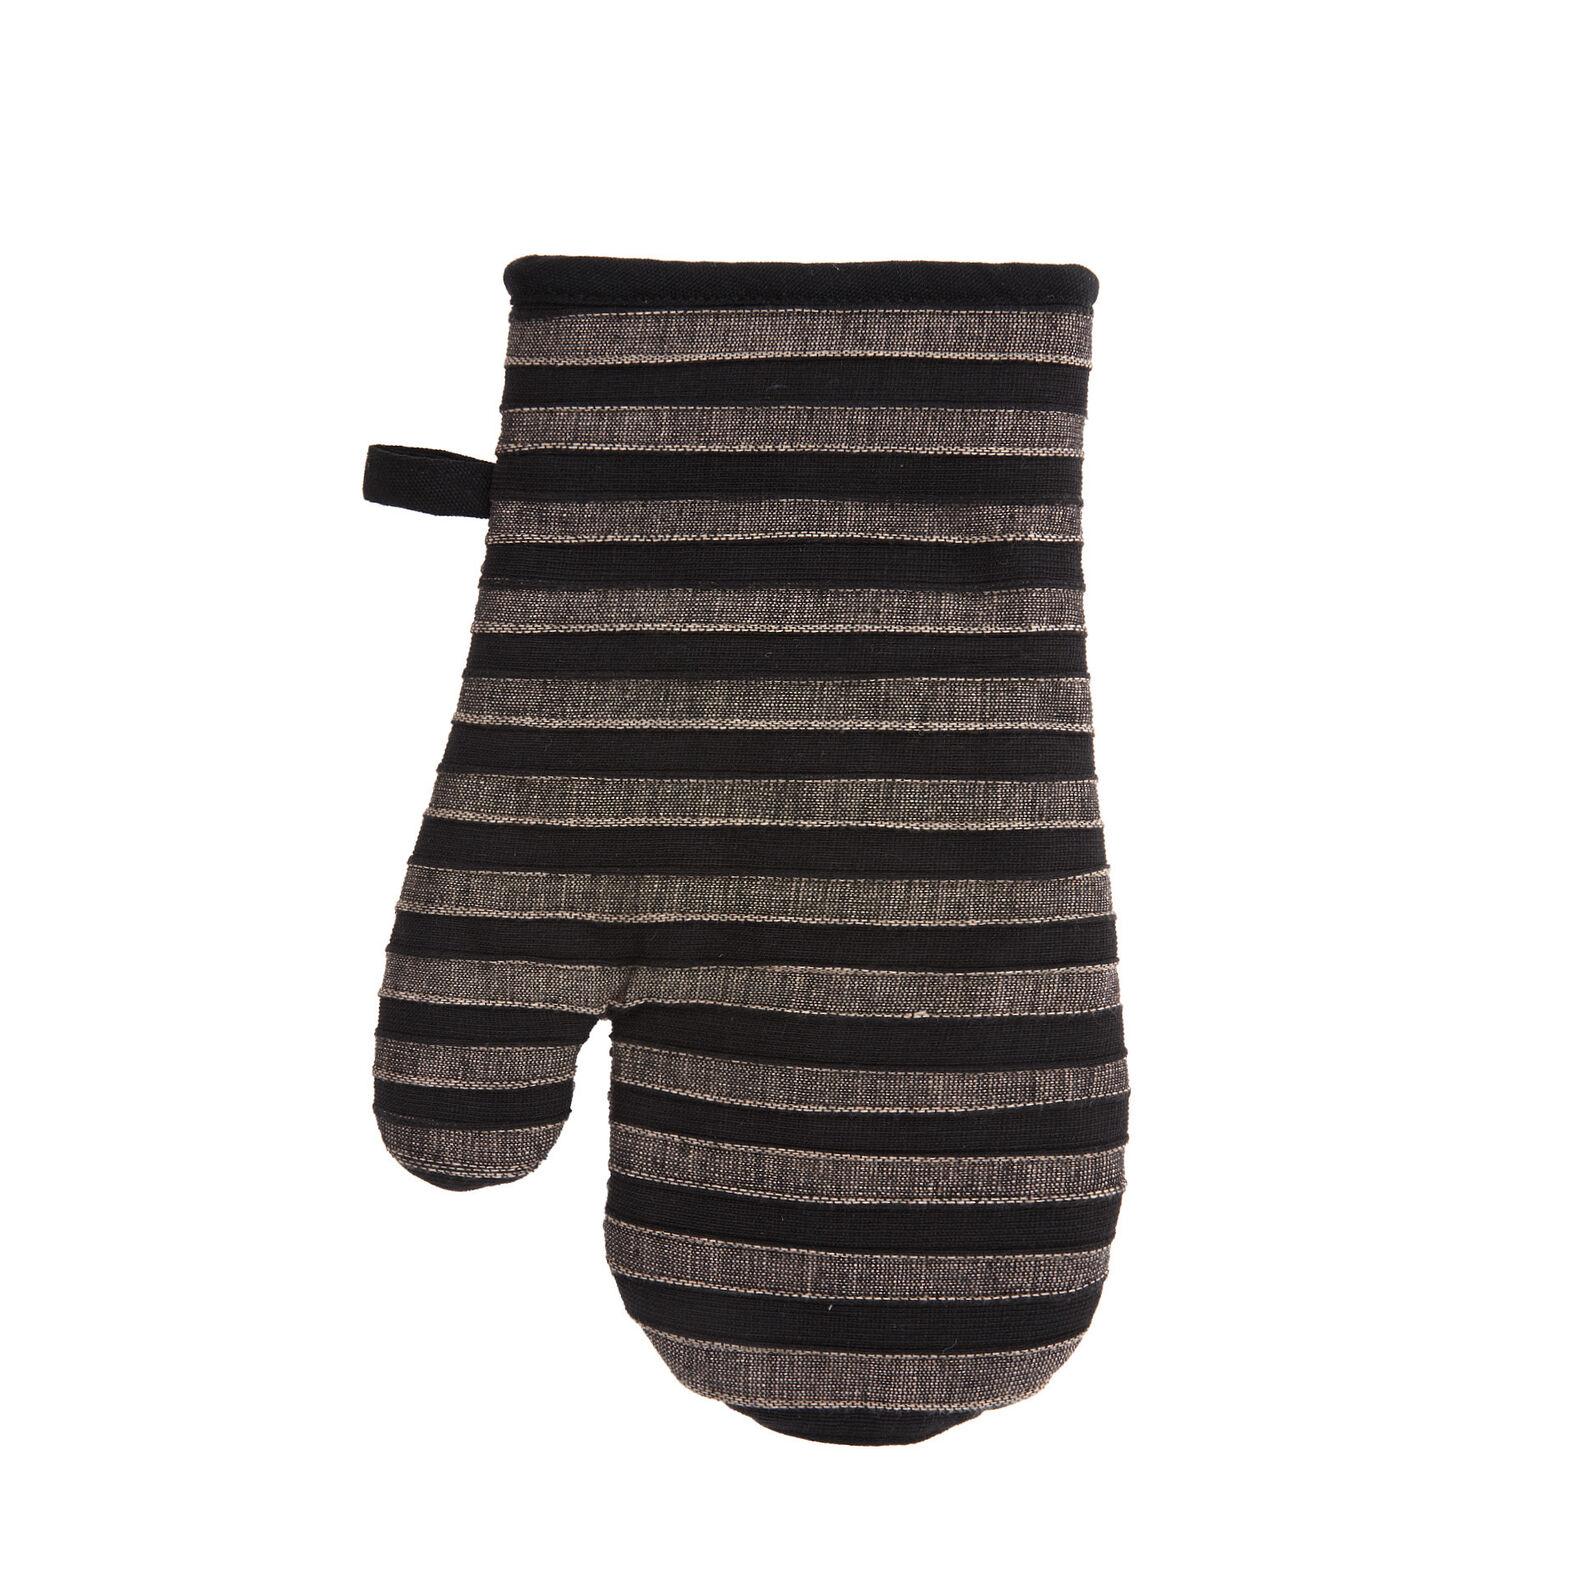 Striped oven mitt in 100% cotton